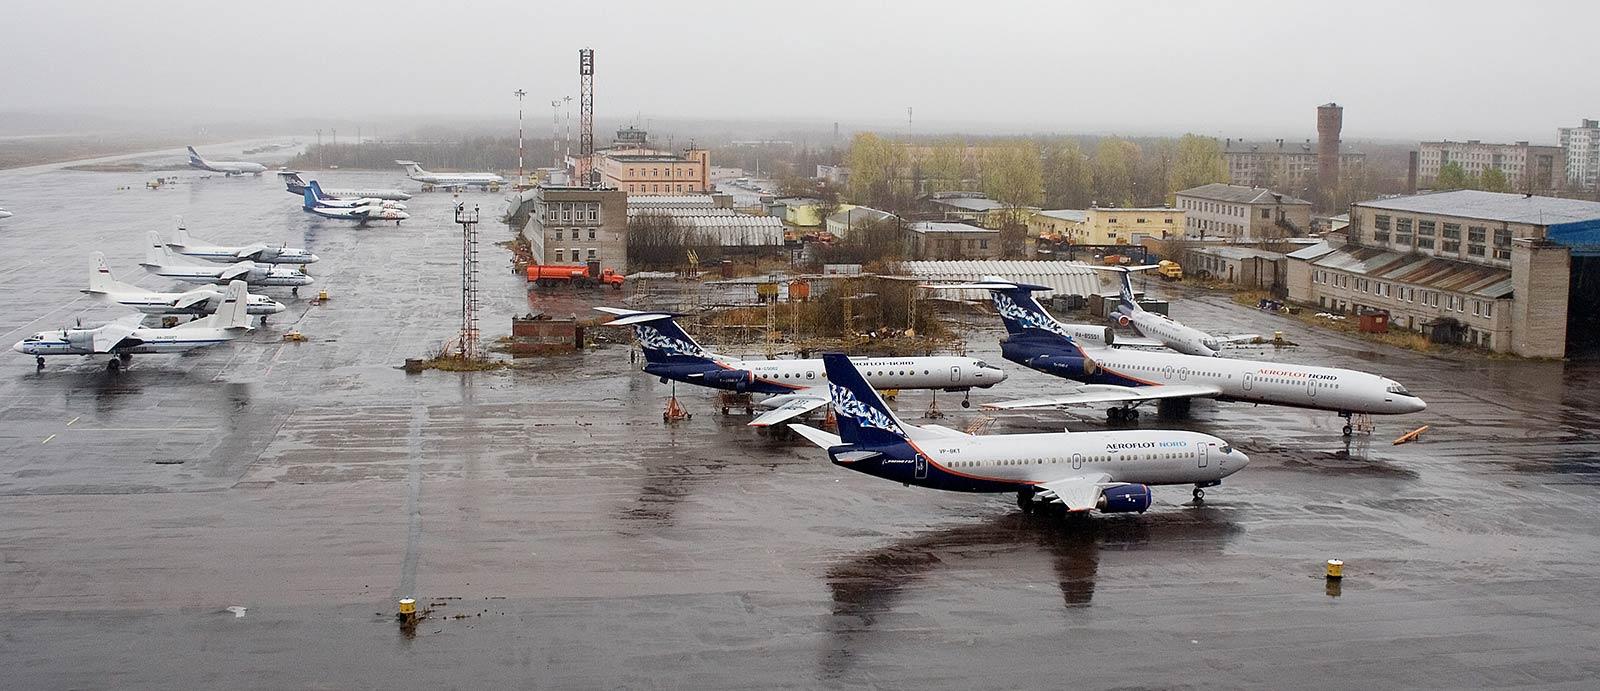 Аэропорт Талаги Архангельск (Arkhangelsk ...: kakdobratsyado.ru/country/rf/aeroports-rf/aeroport-talagi...